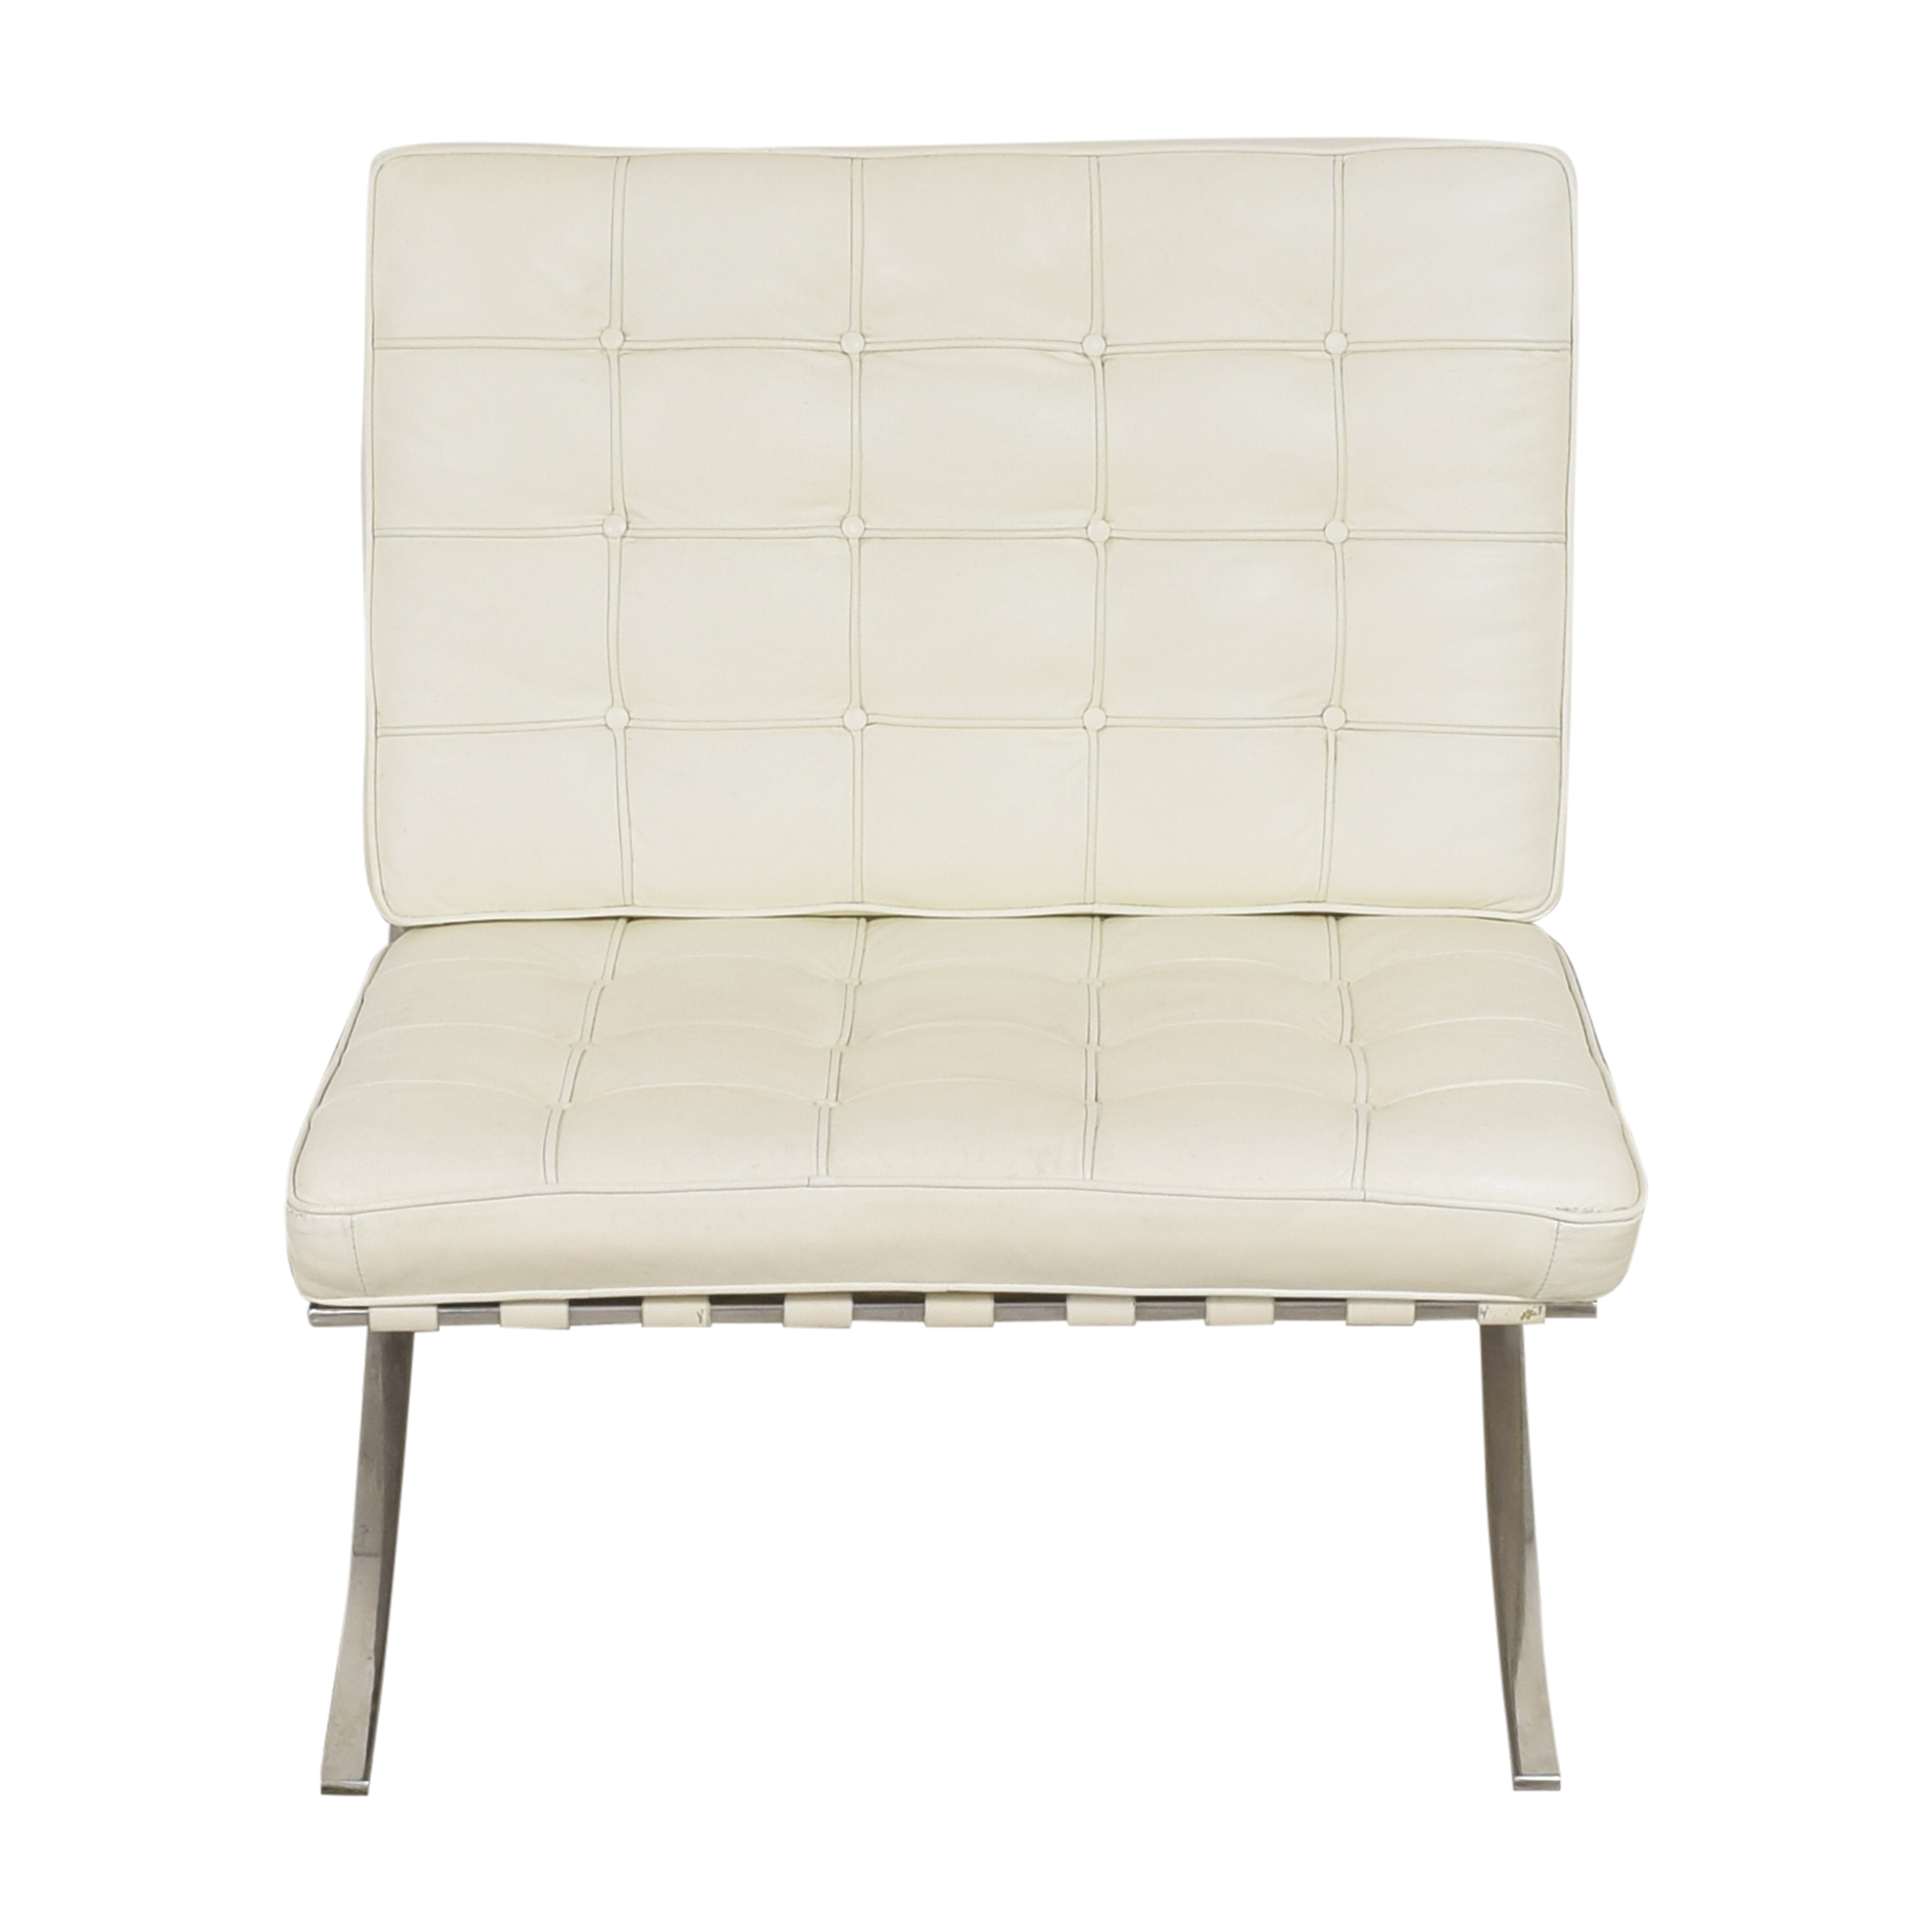 Modern Classics Modern Classics Barcelona Chair Replica Accent Chairs